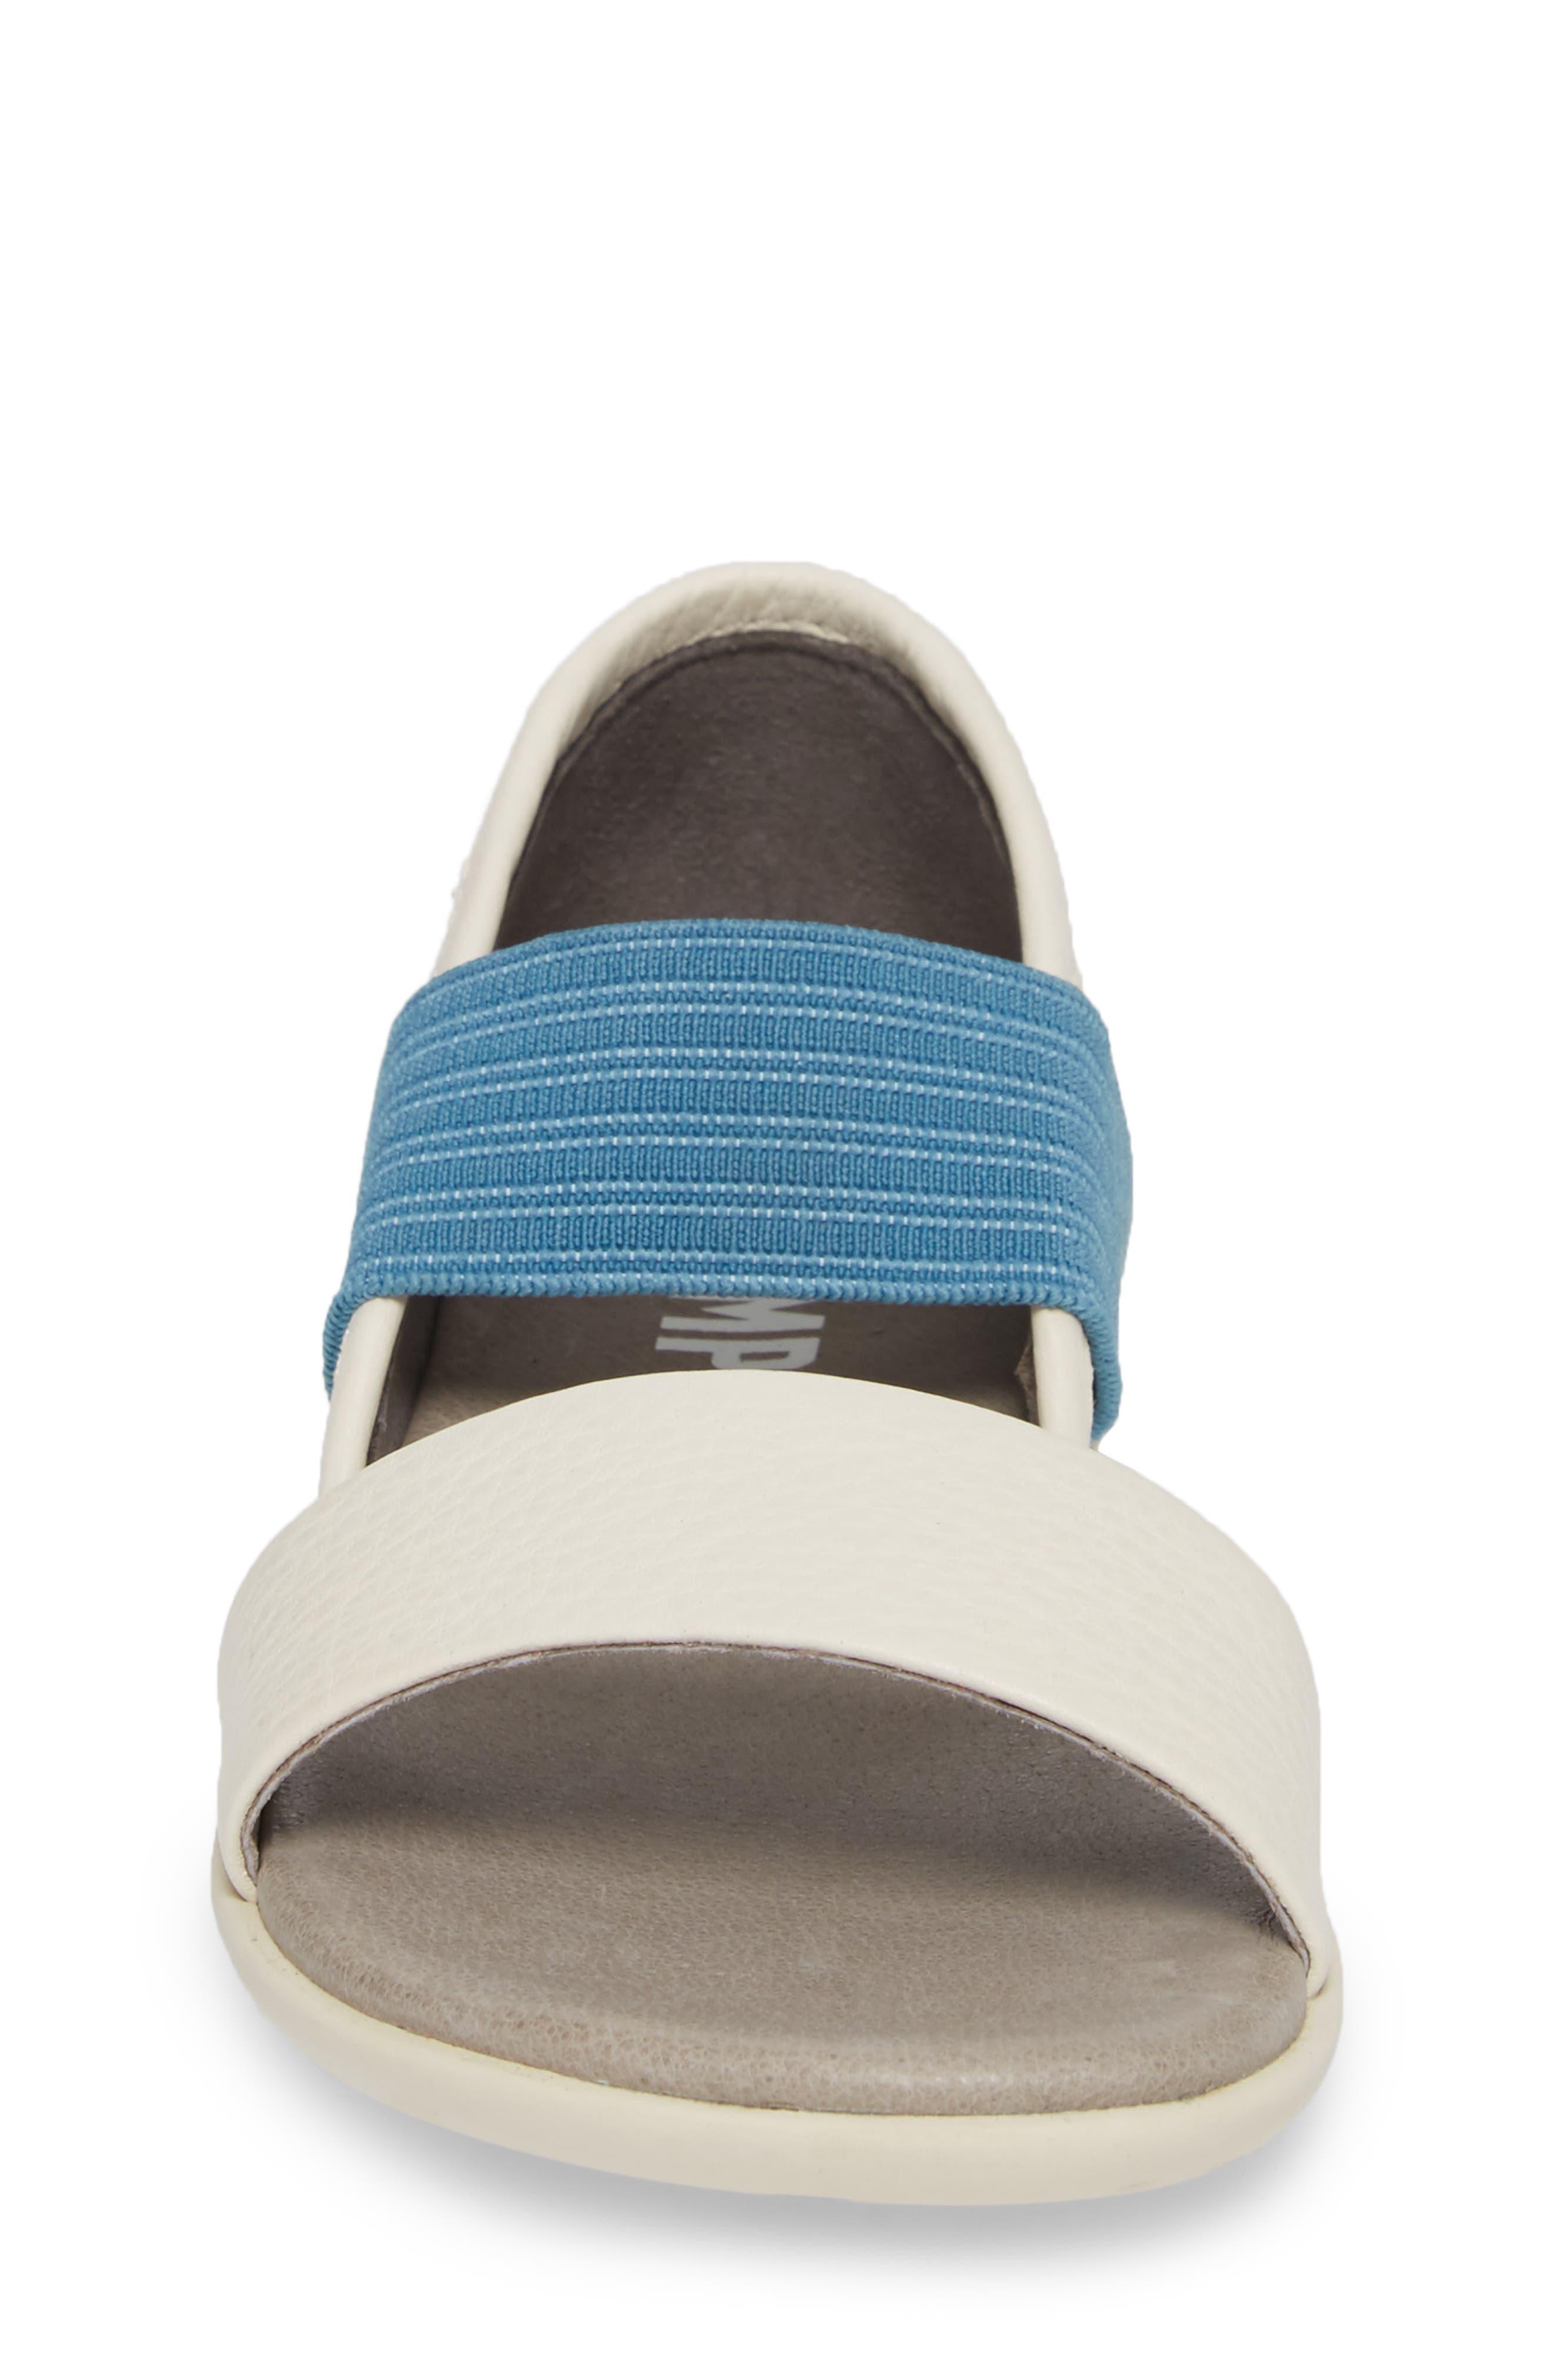 Right Sandal,                             Alternate thumbnail 4, color,                             WHITE